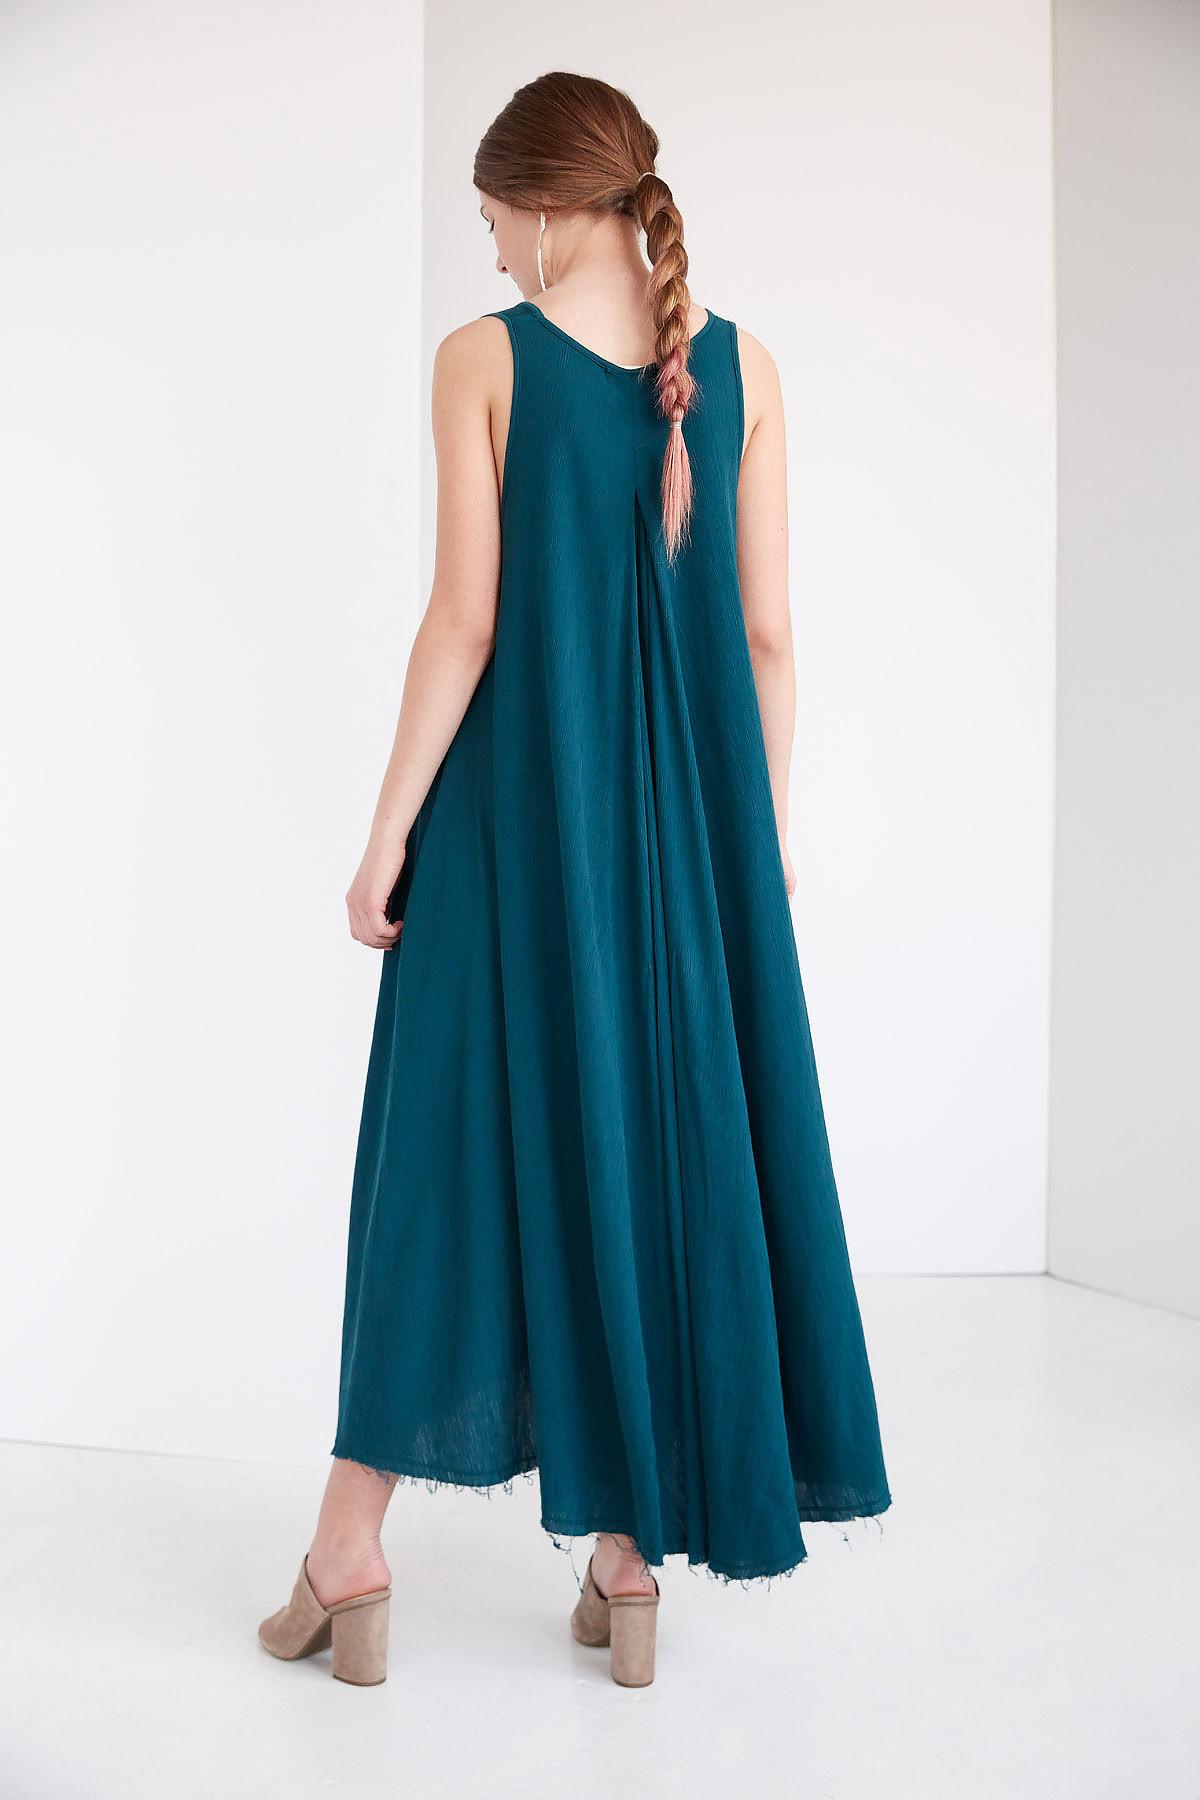 Black Crane Floral Dress Peacock Garmentory